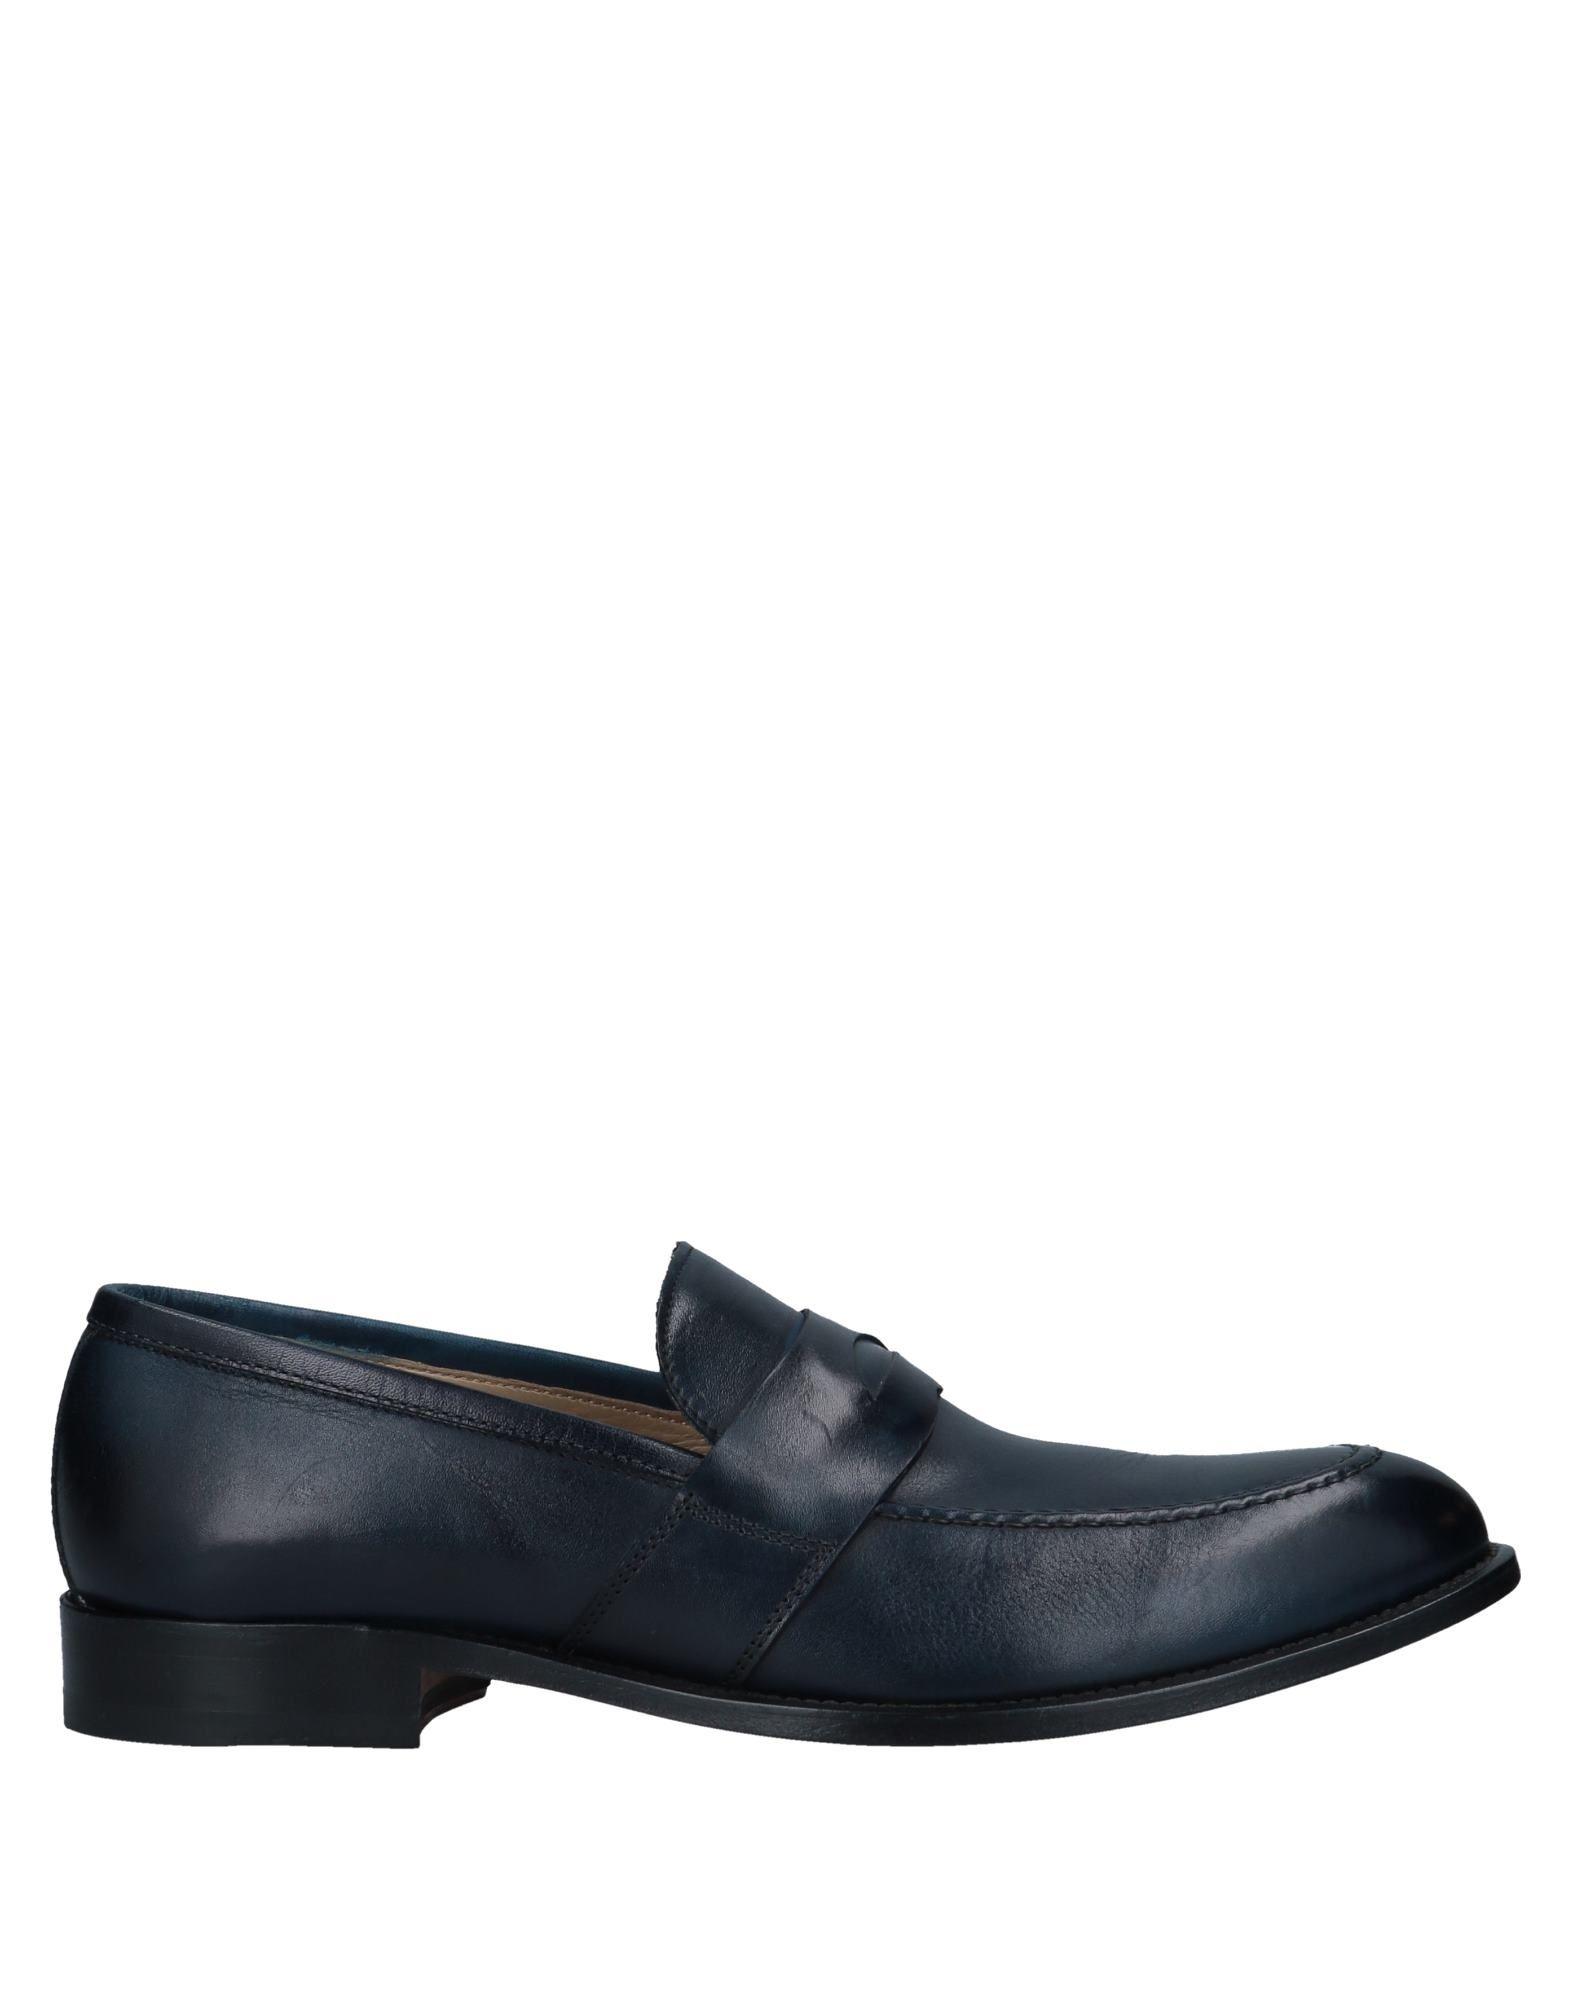 Baldinini Mokassins Herren  11554316SK Gute Qualität beliebte Schuhe